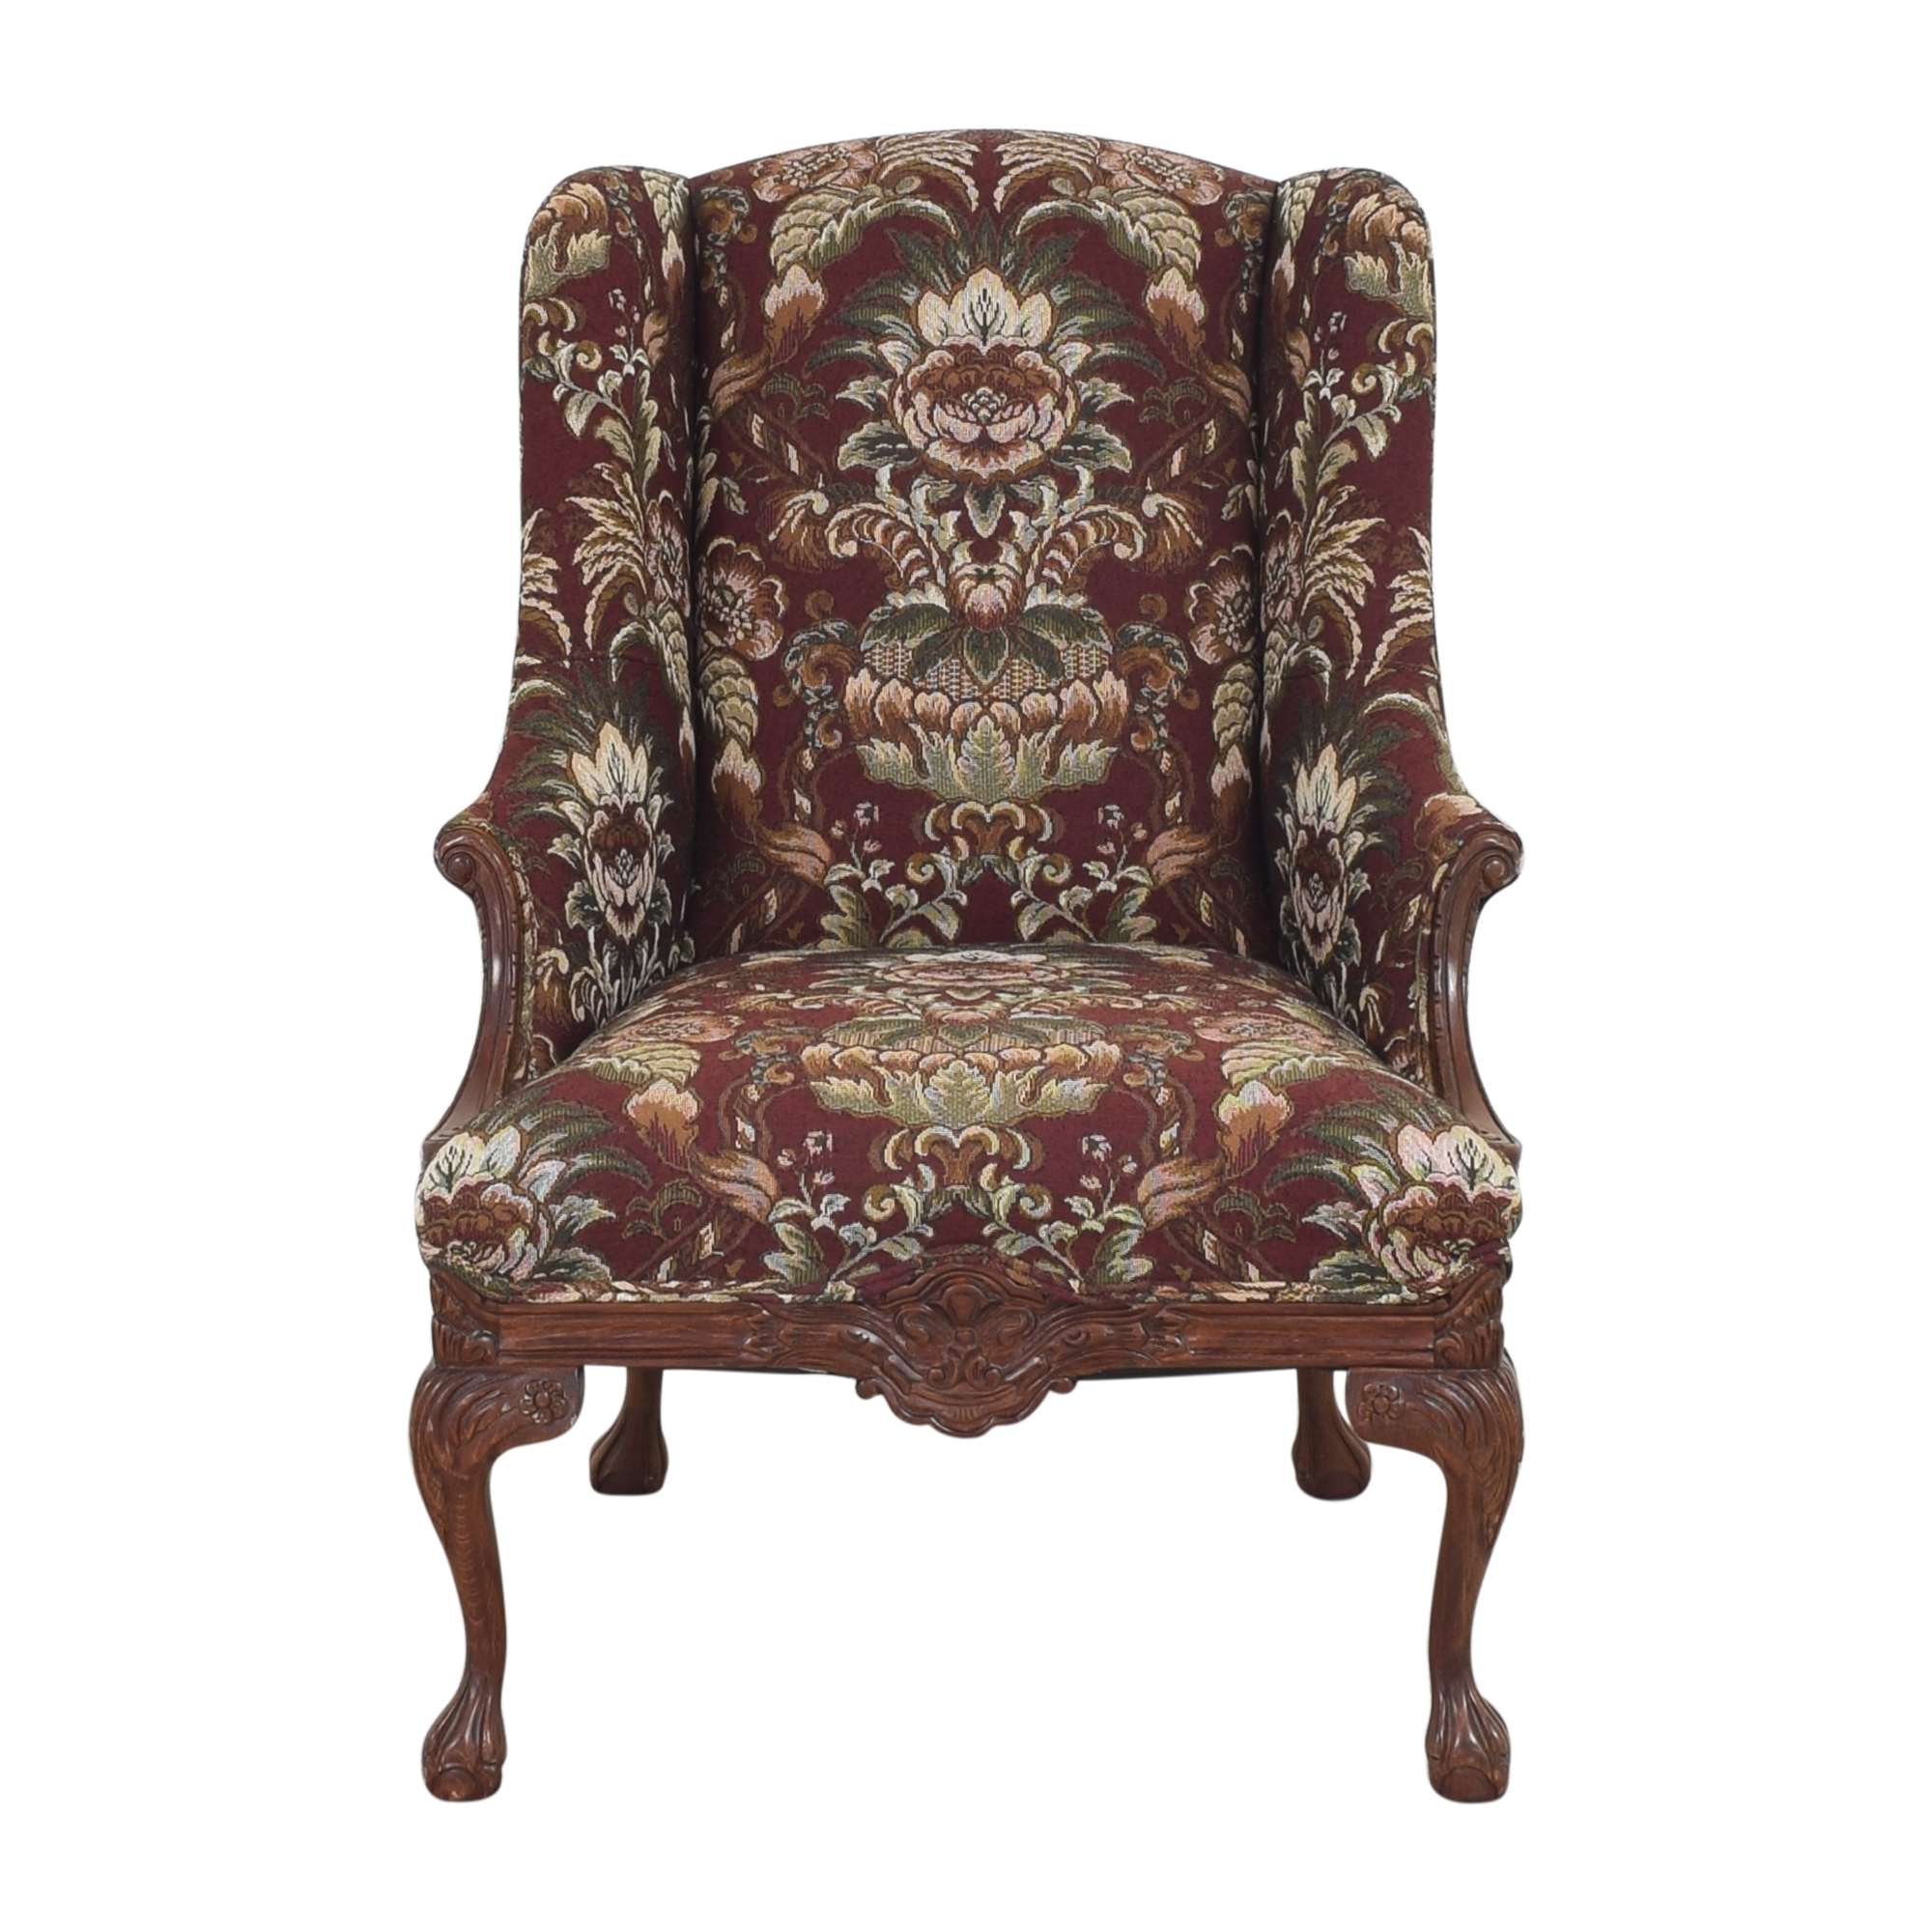 Drexel Heritage Drexel Heritage Wing Back Floral Chair